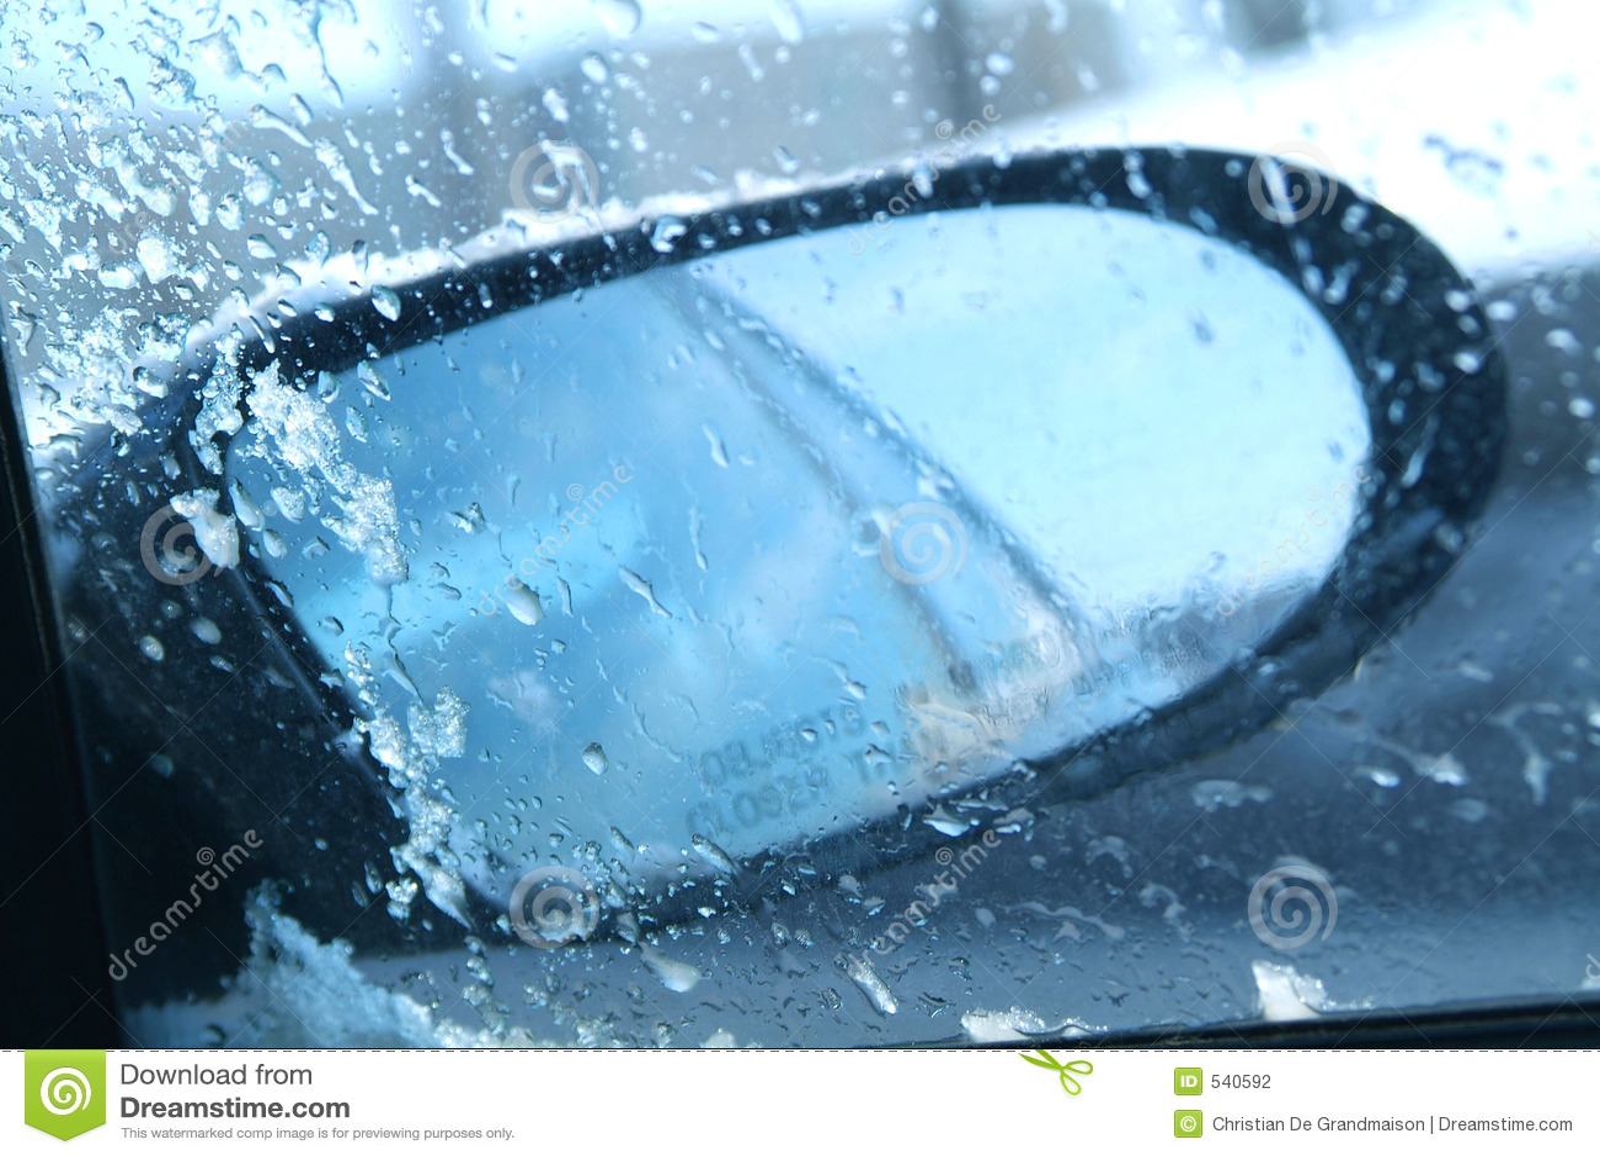 Download 视窗 库存照片. 图片 包括有 视窗, 汽车, 循环, 蓝色, 室外, 搅打器, 尘土 - 540592